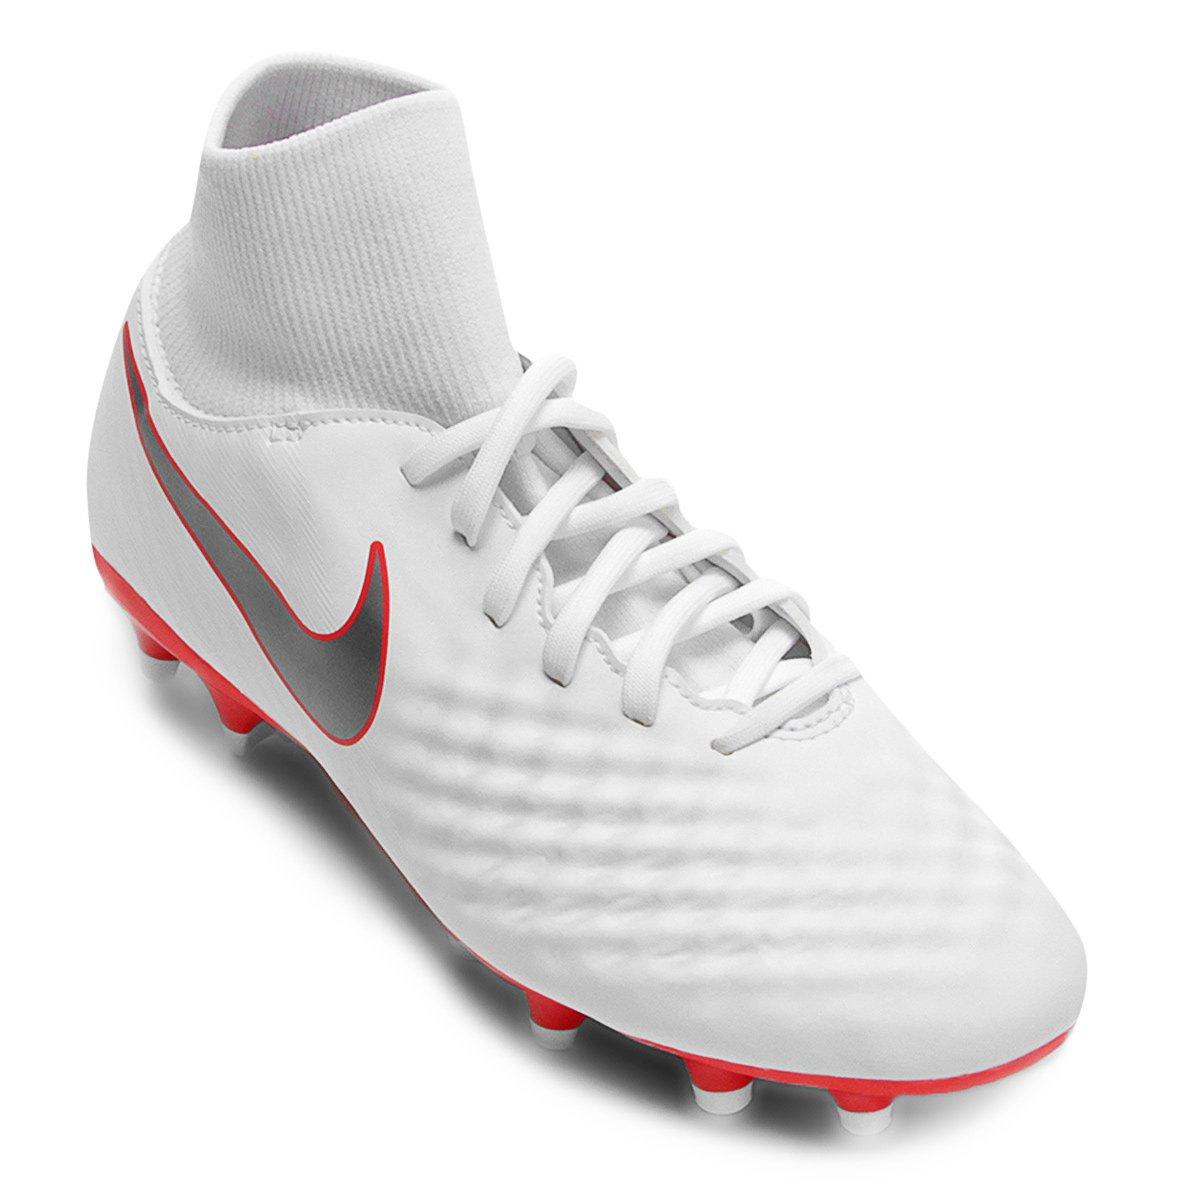 Buy Retro Nike Magista Obra II Motion Blur FG Football Boots